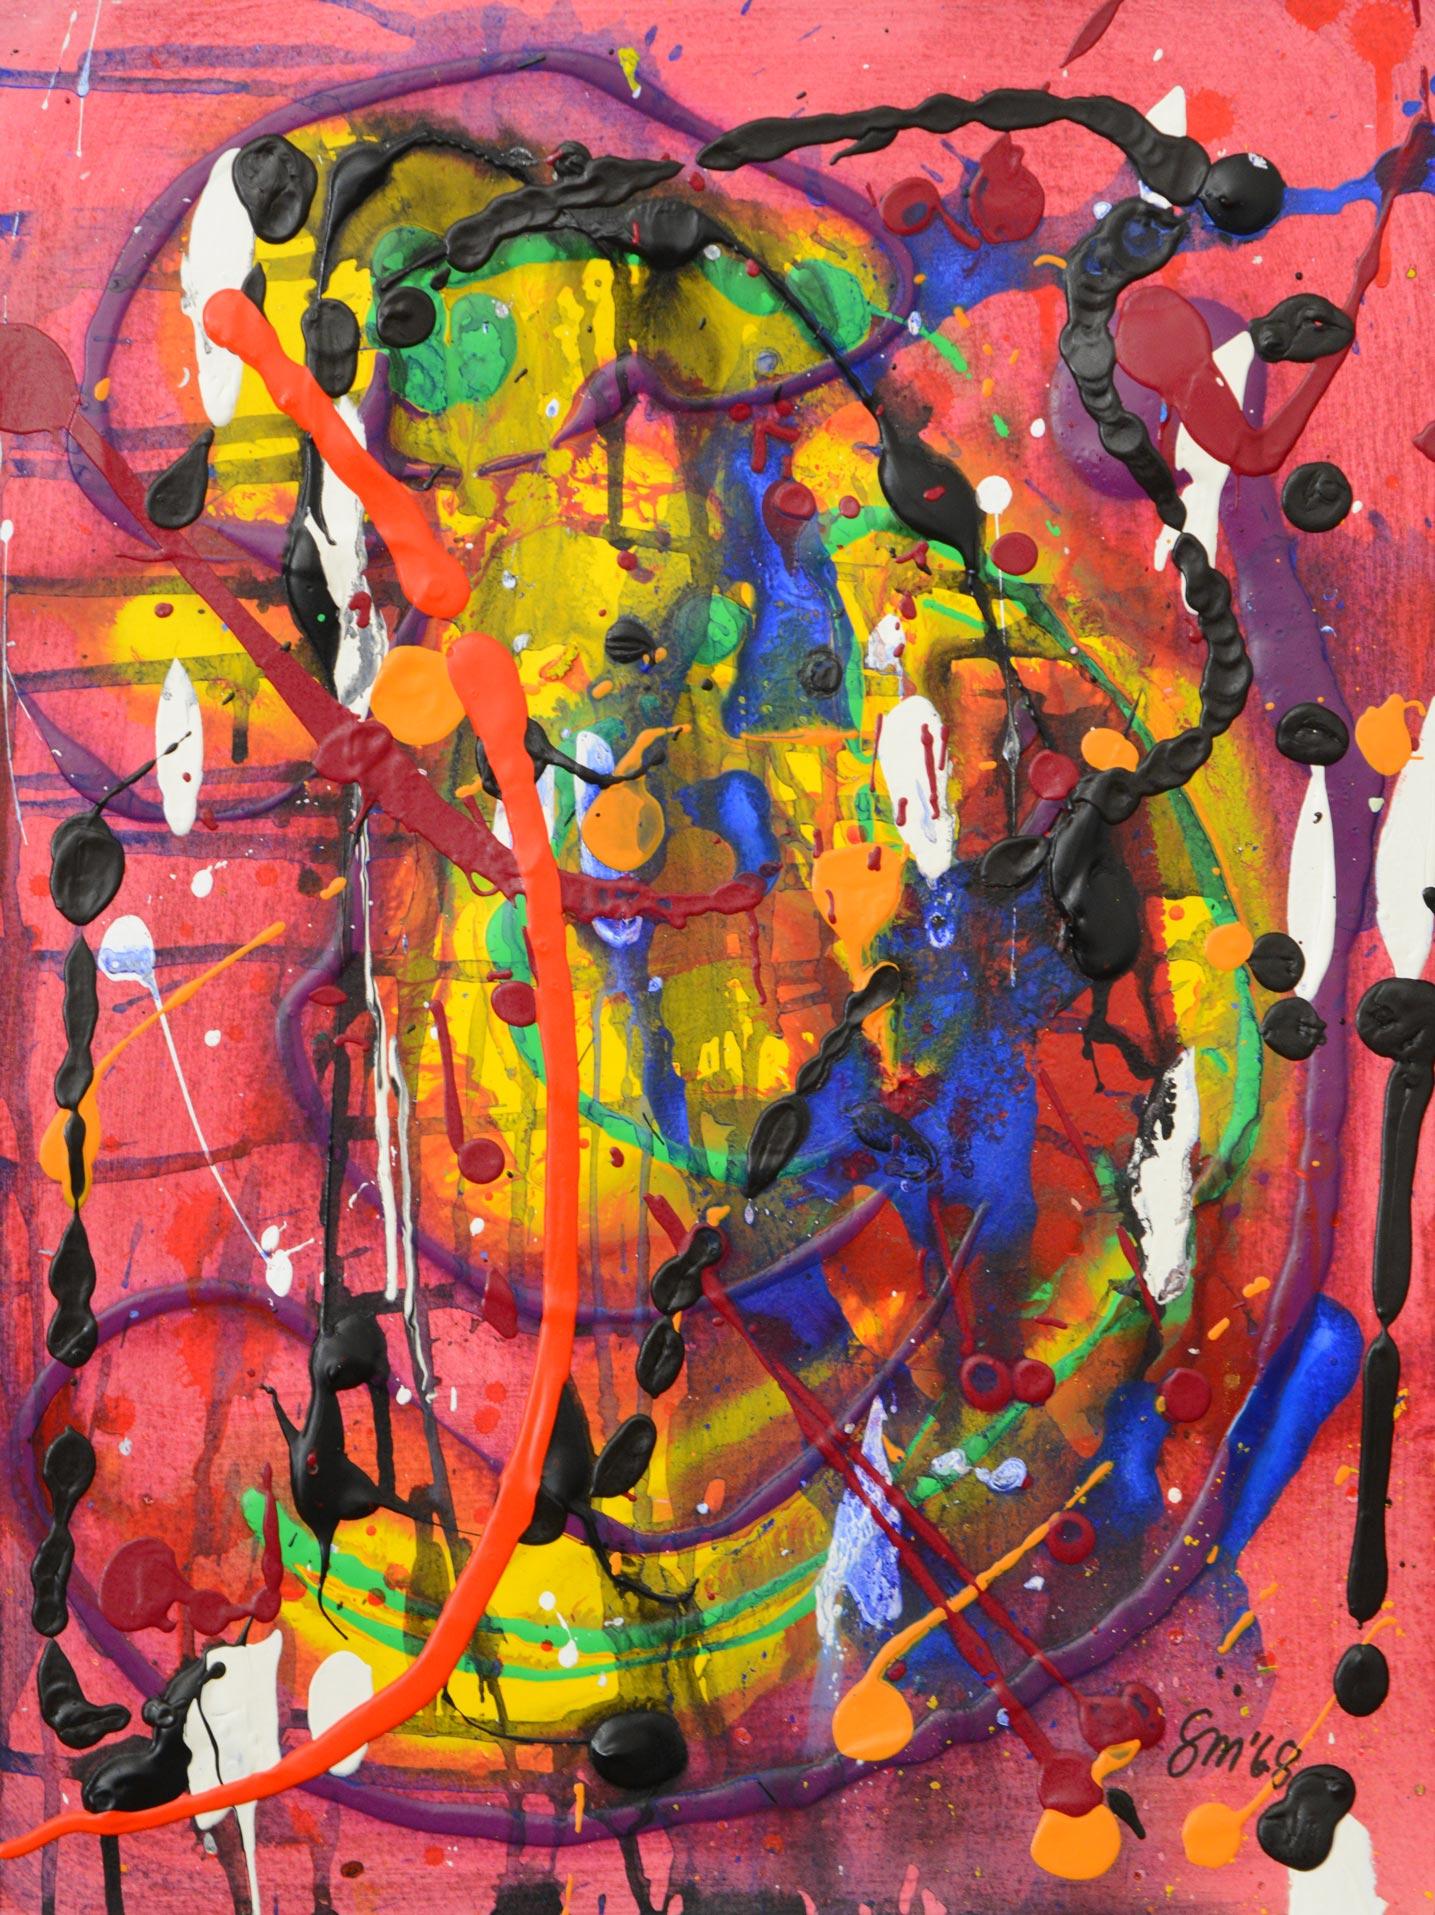 Abstrakte Komposition 4 | Acrylfarben Aquarellfarben auf Papier